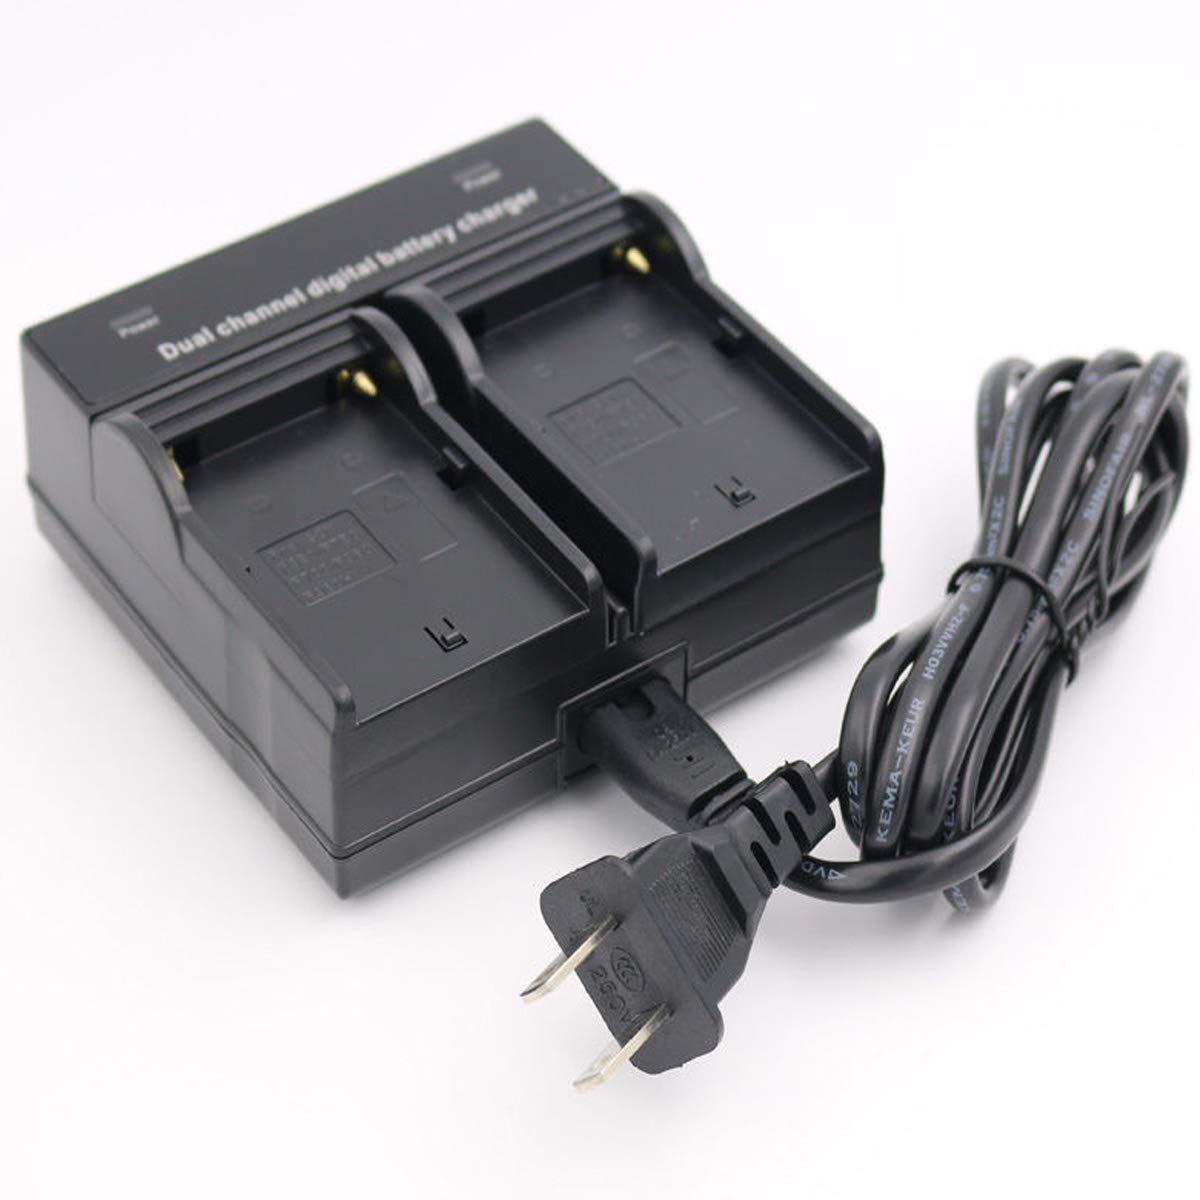 MVC-CD400 MVC-CD500 AC Adapter Power Supply for Sony MVC-CD200 MVC-CD1000 Mavica Digital Camera MVC-CD300